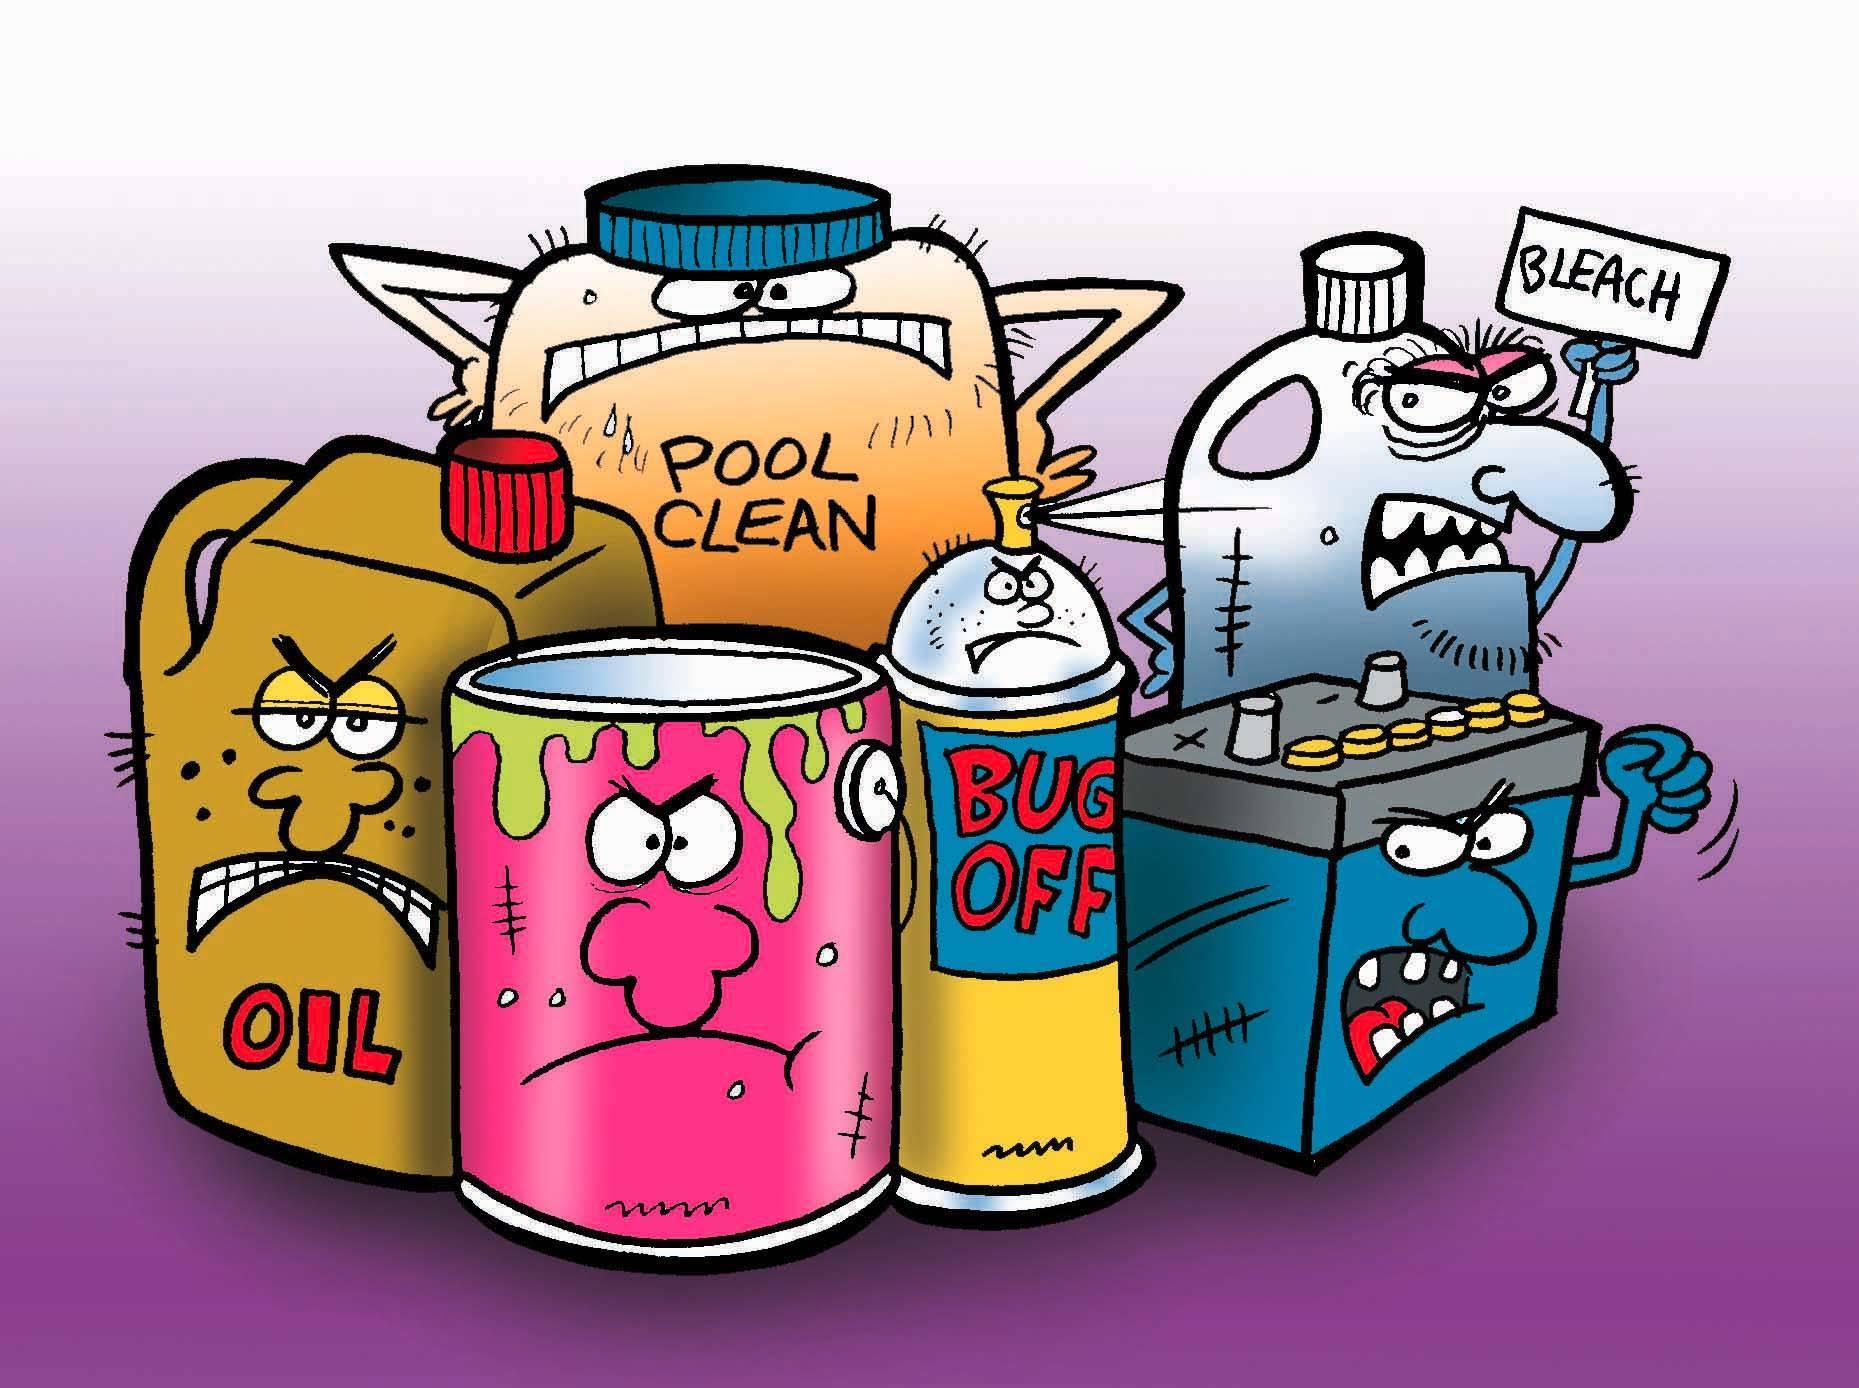 179da7a93504290bd08d_household_hazardous_waste.jpg